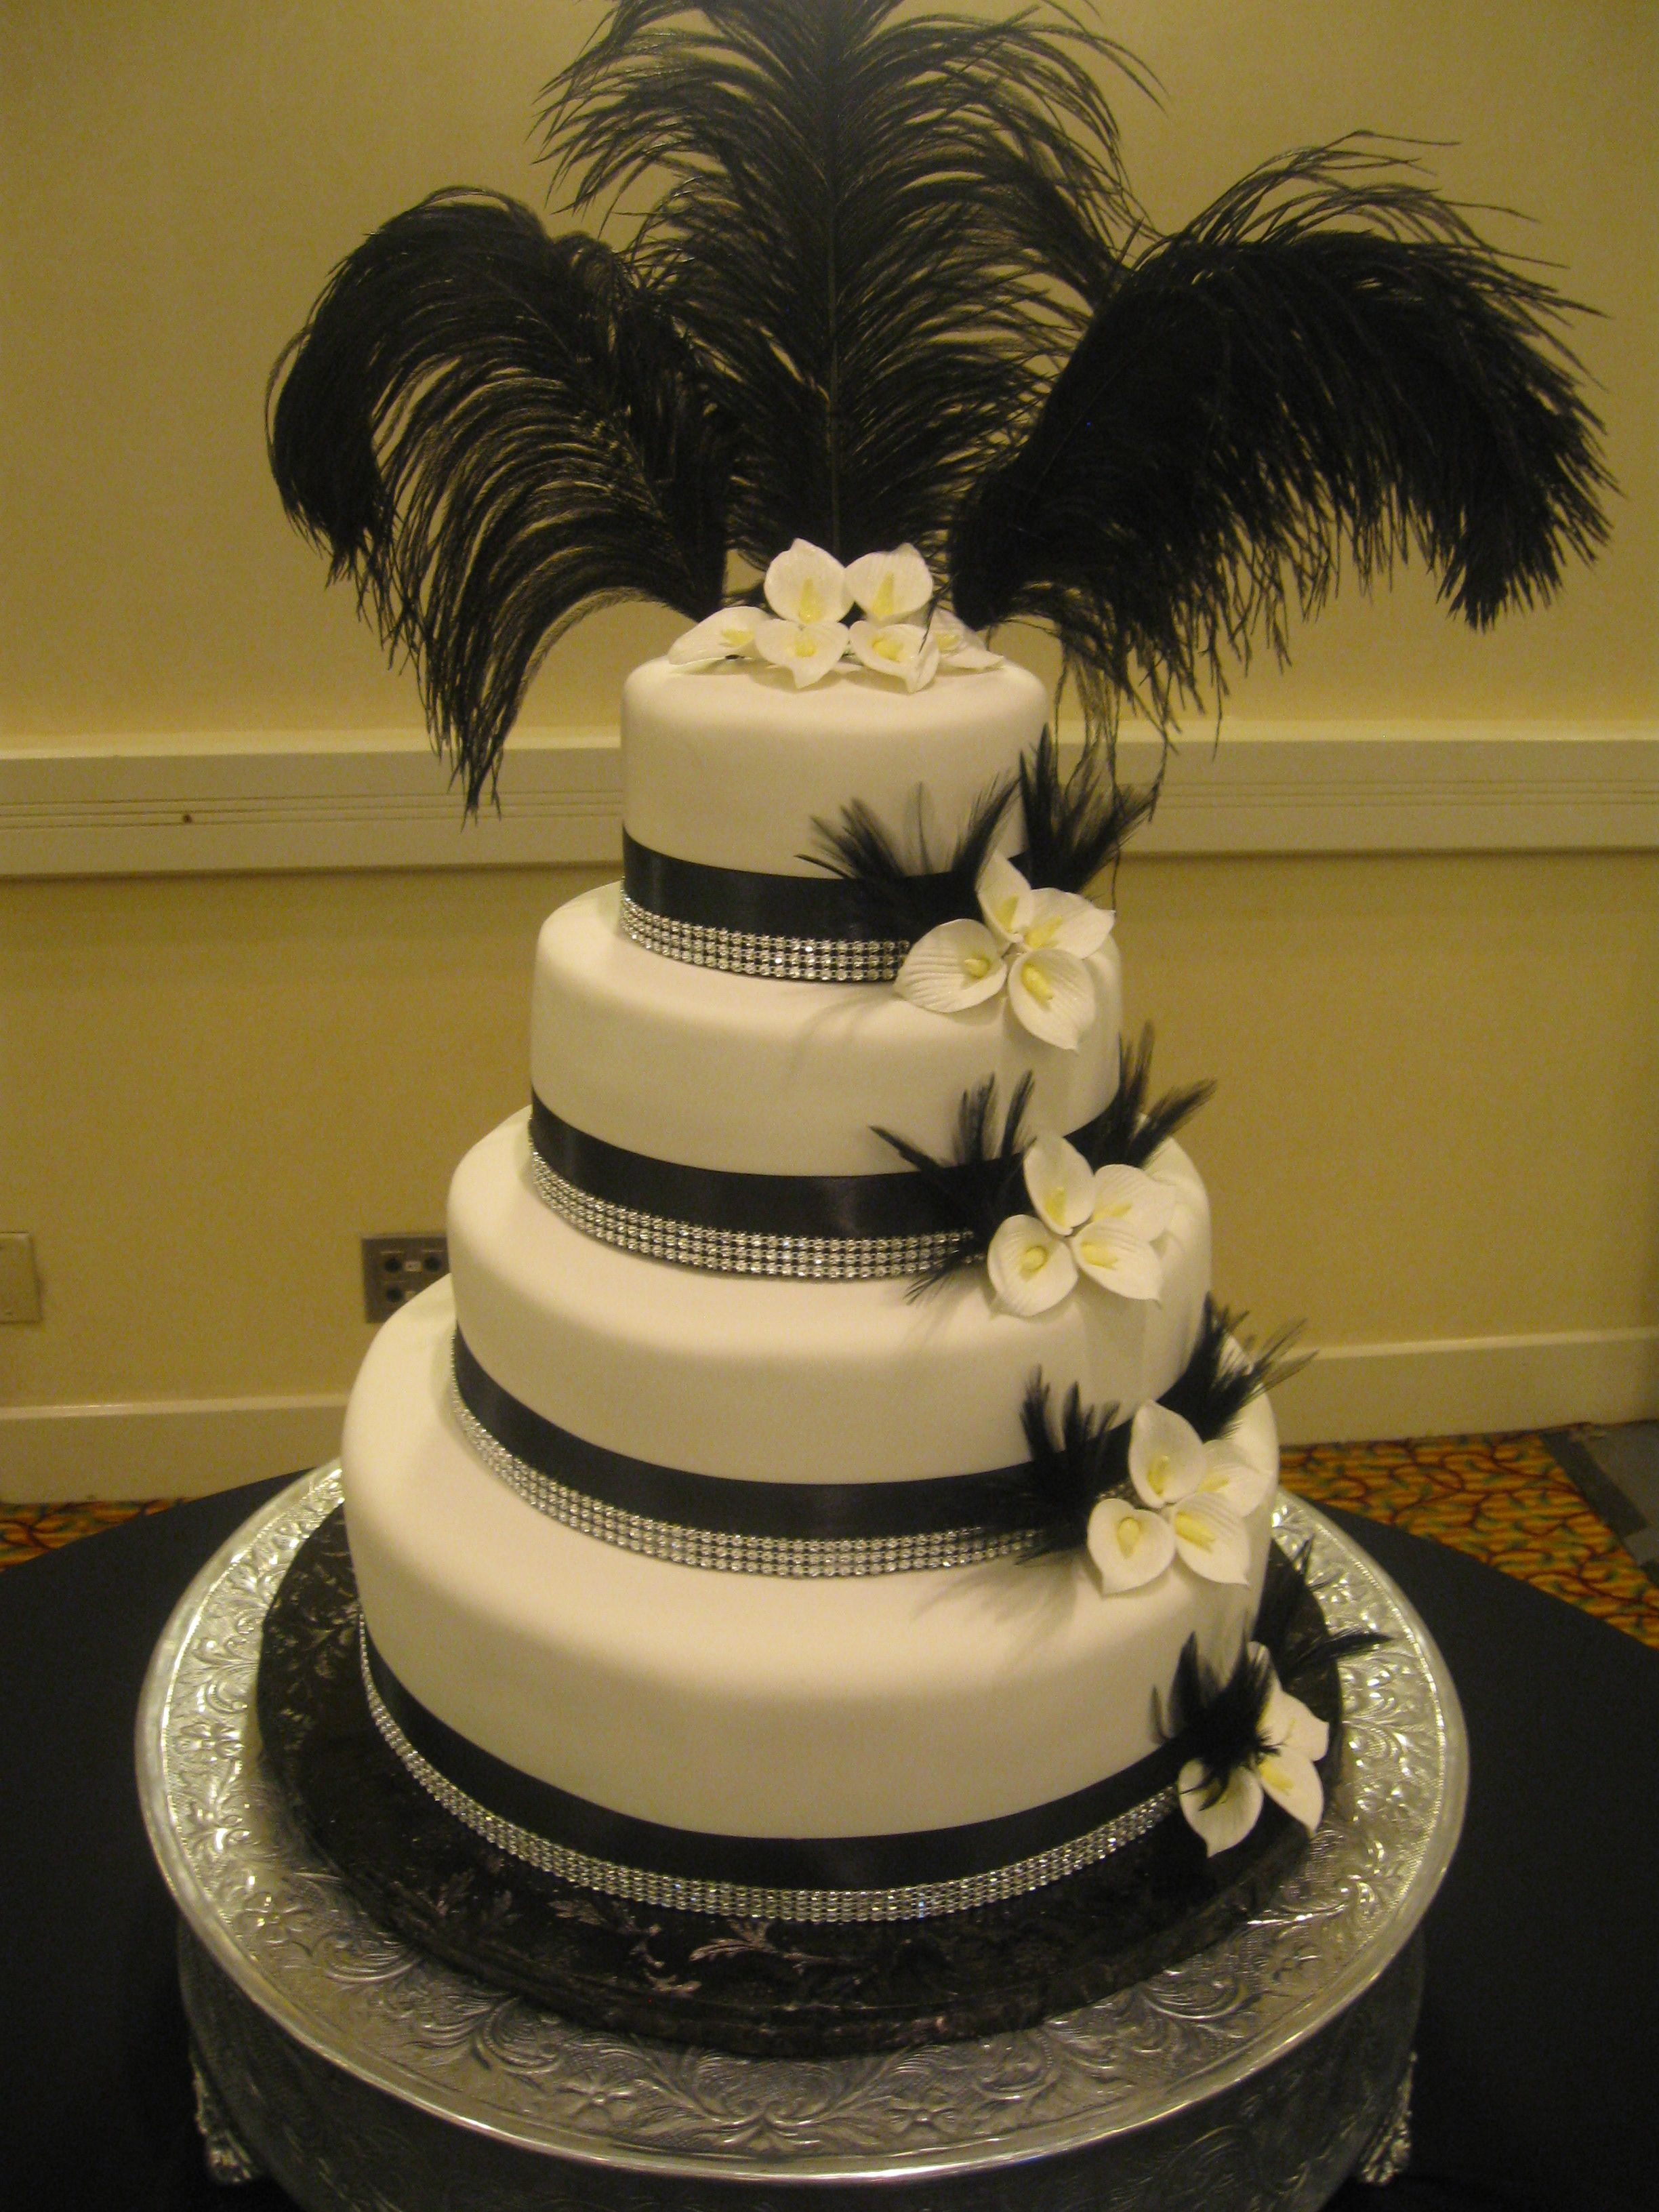 Black and White Wedding Cake with Rhinestones and Calla Lillies, 11 ...